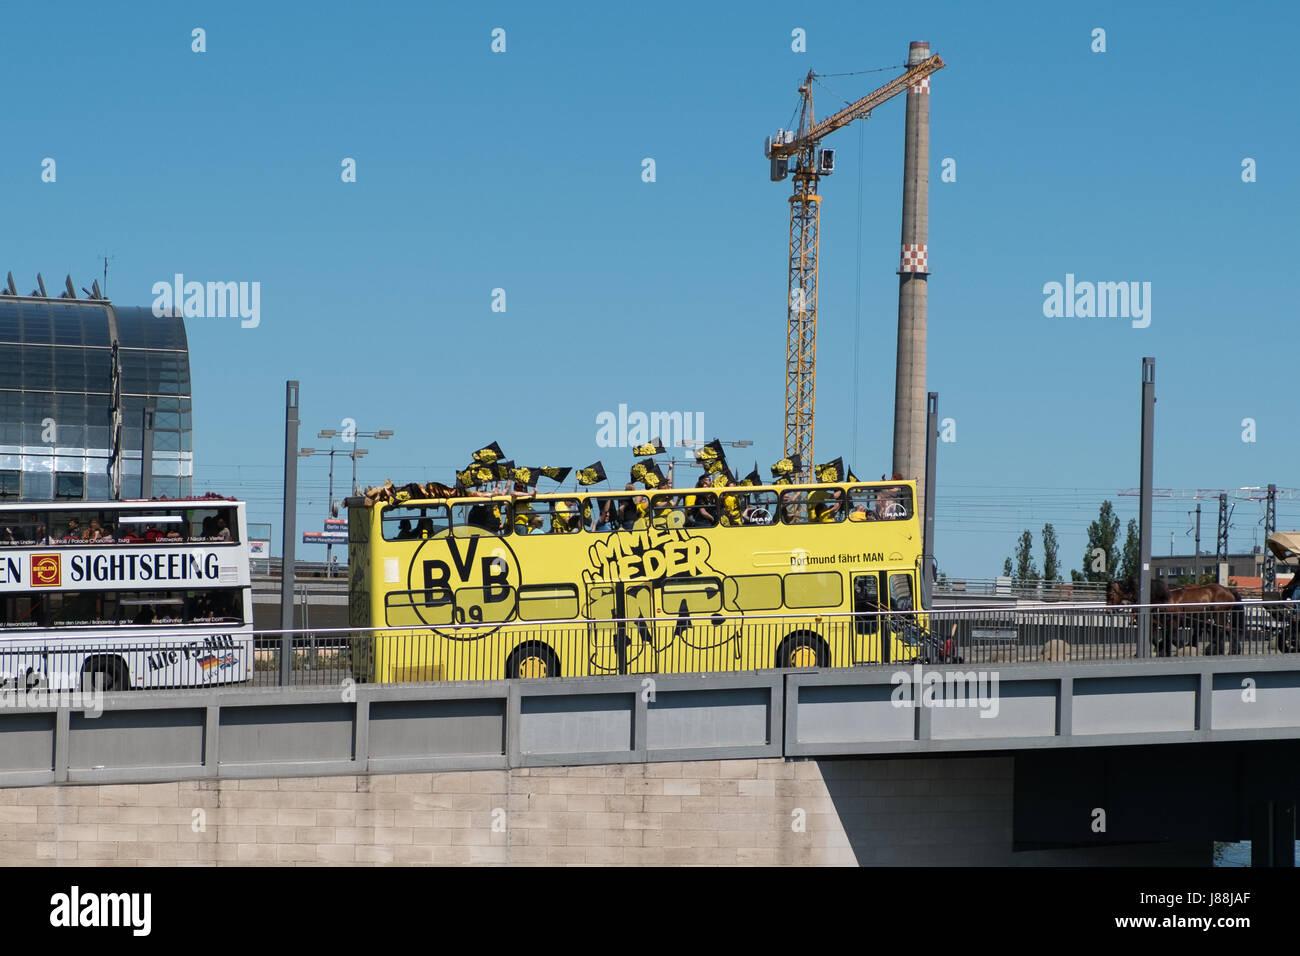 Berlin, Germany - may 27, 2017: BVB Fans / Borussia Dortmund Fan Bus in Berlin on the day of the DFB-Pokal final. - Stock Image